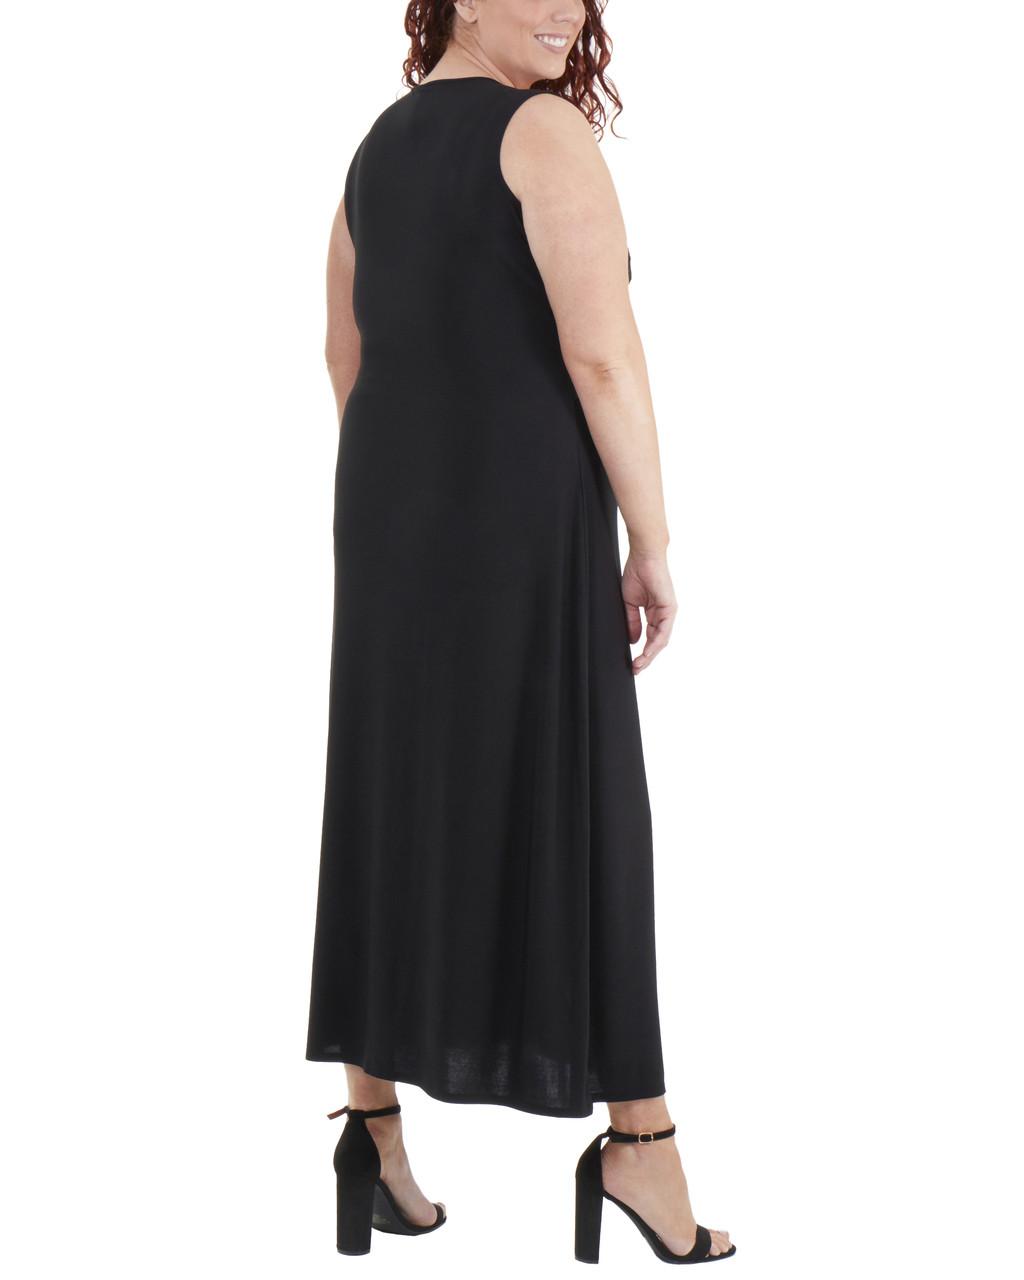 Plus Size Wrap Front Maxi Dress with Hardware Belt Trim~Black*WITD3767